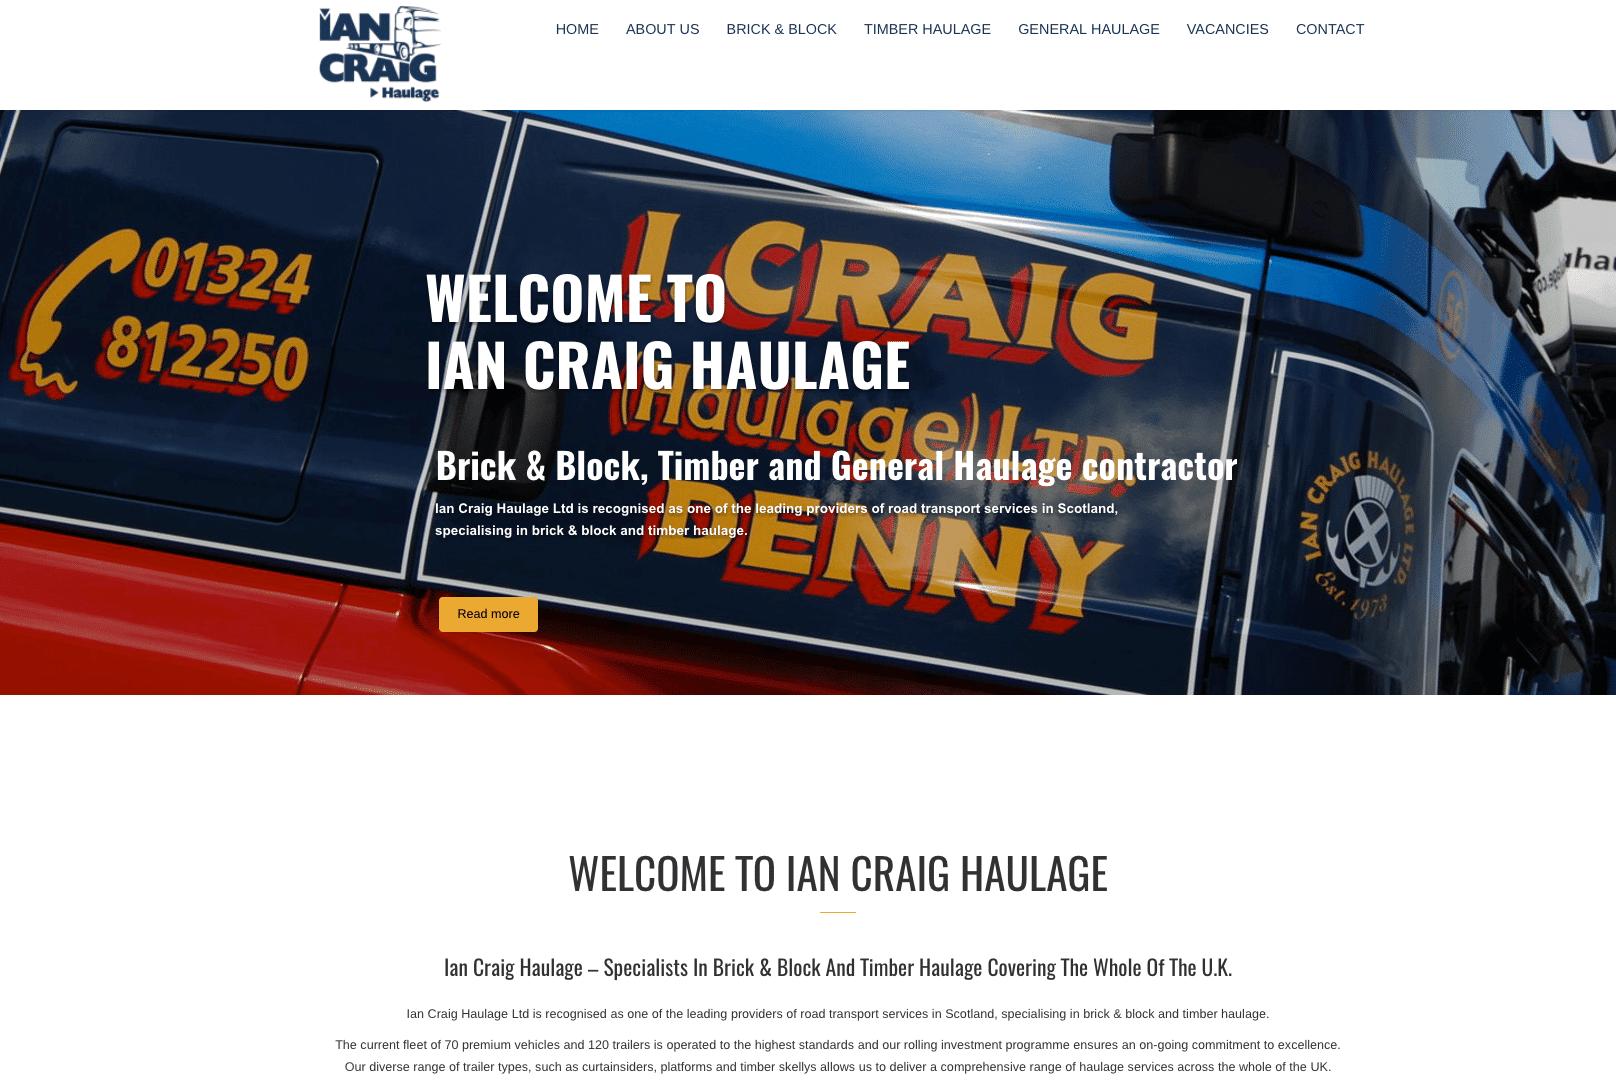 Ian Craig Haulage - home